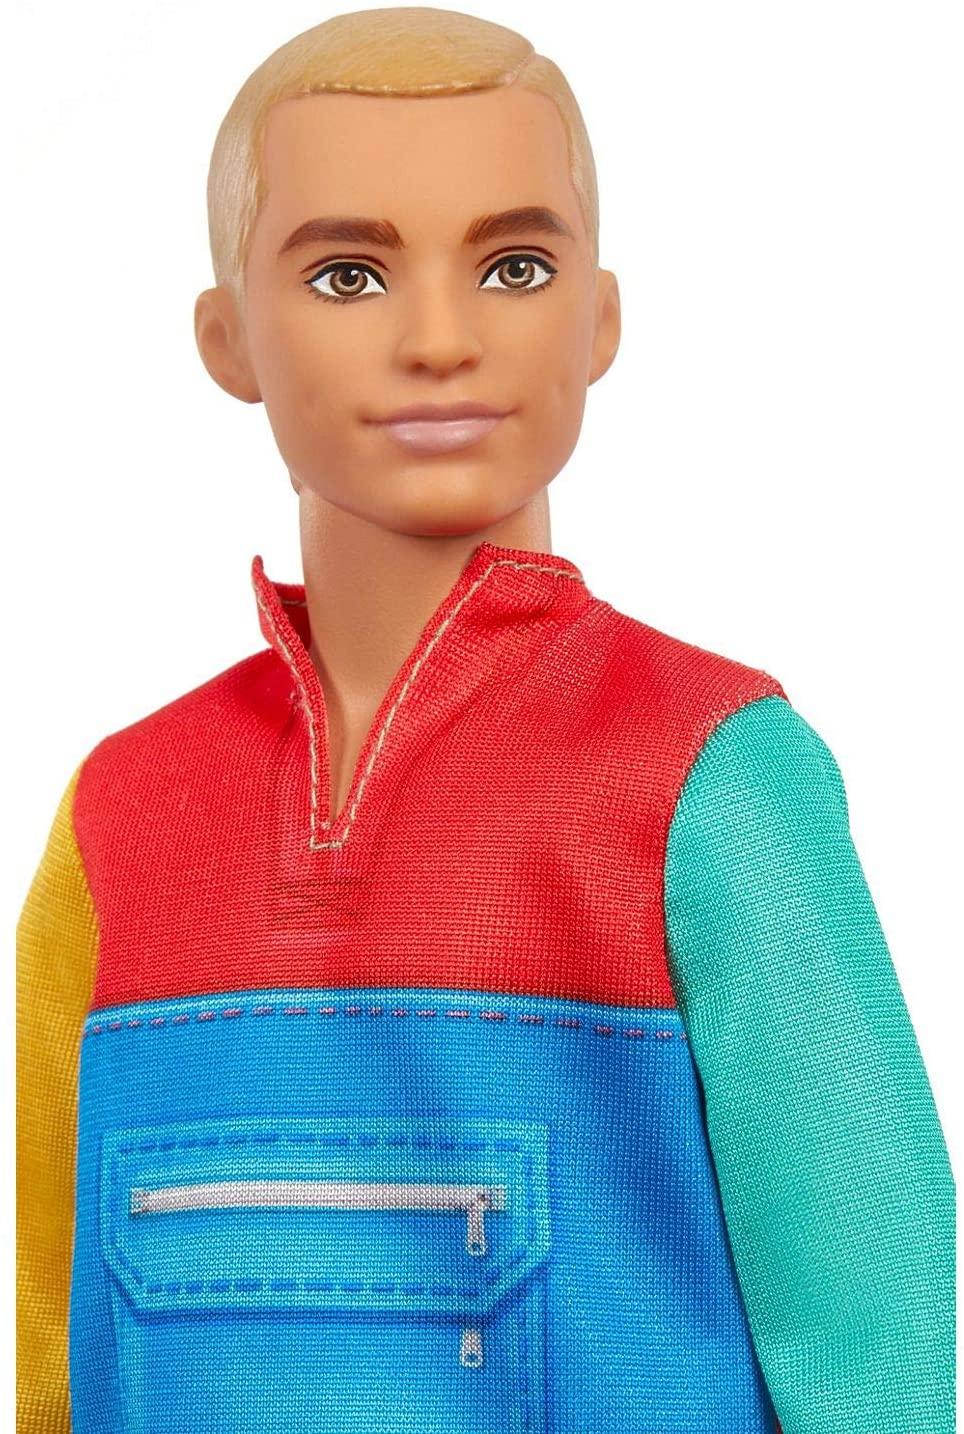 Ken Fashionistas - 163 Cabelo Loiro Casaco Colorido